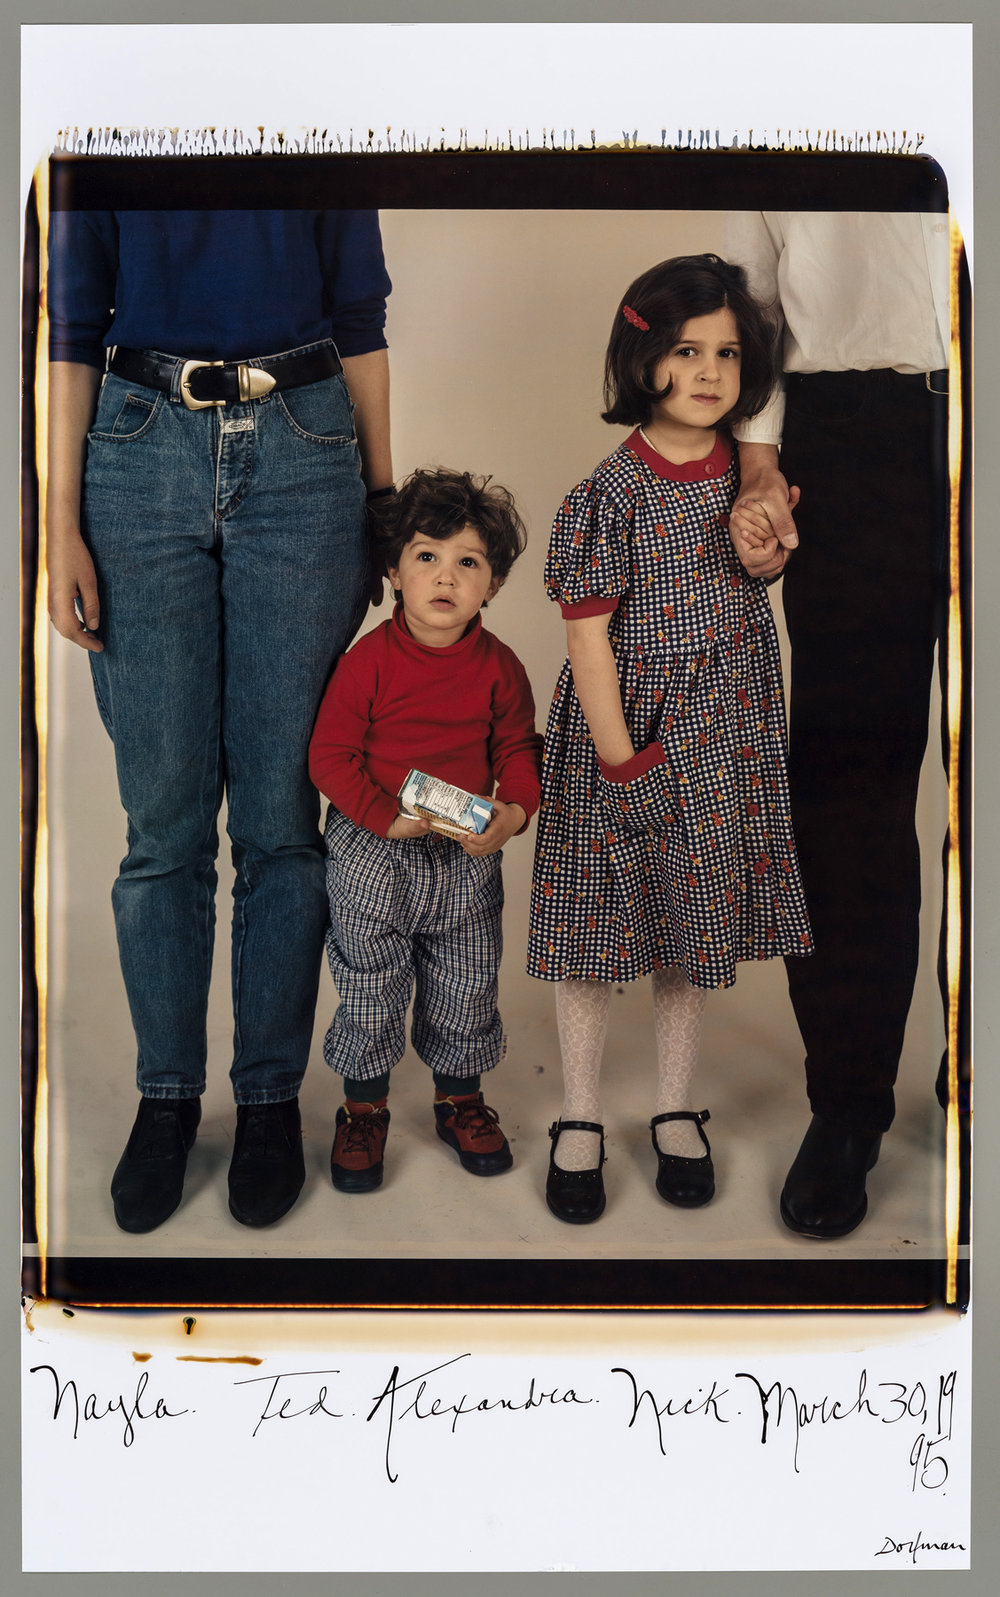 08_nayla-ted-alexandra-nick-march-30-1995_elsa-dorfman-web.jpg